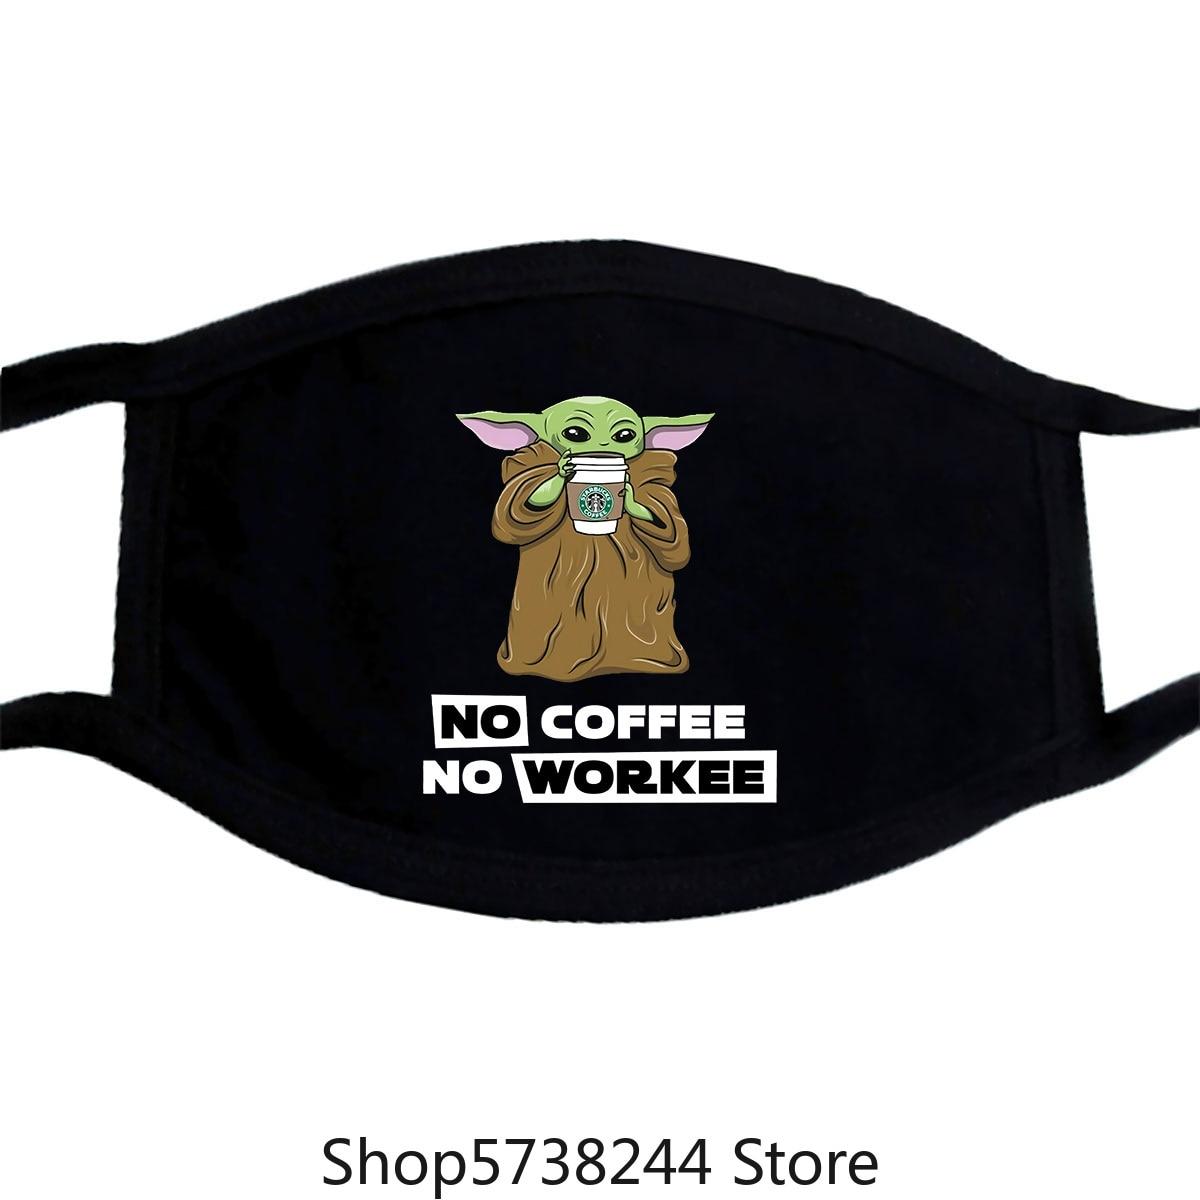 Baby Yoda Star Work Funny Nice Gift Mask Washable Reusable Mask For Unisex Black